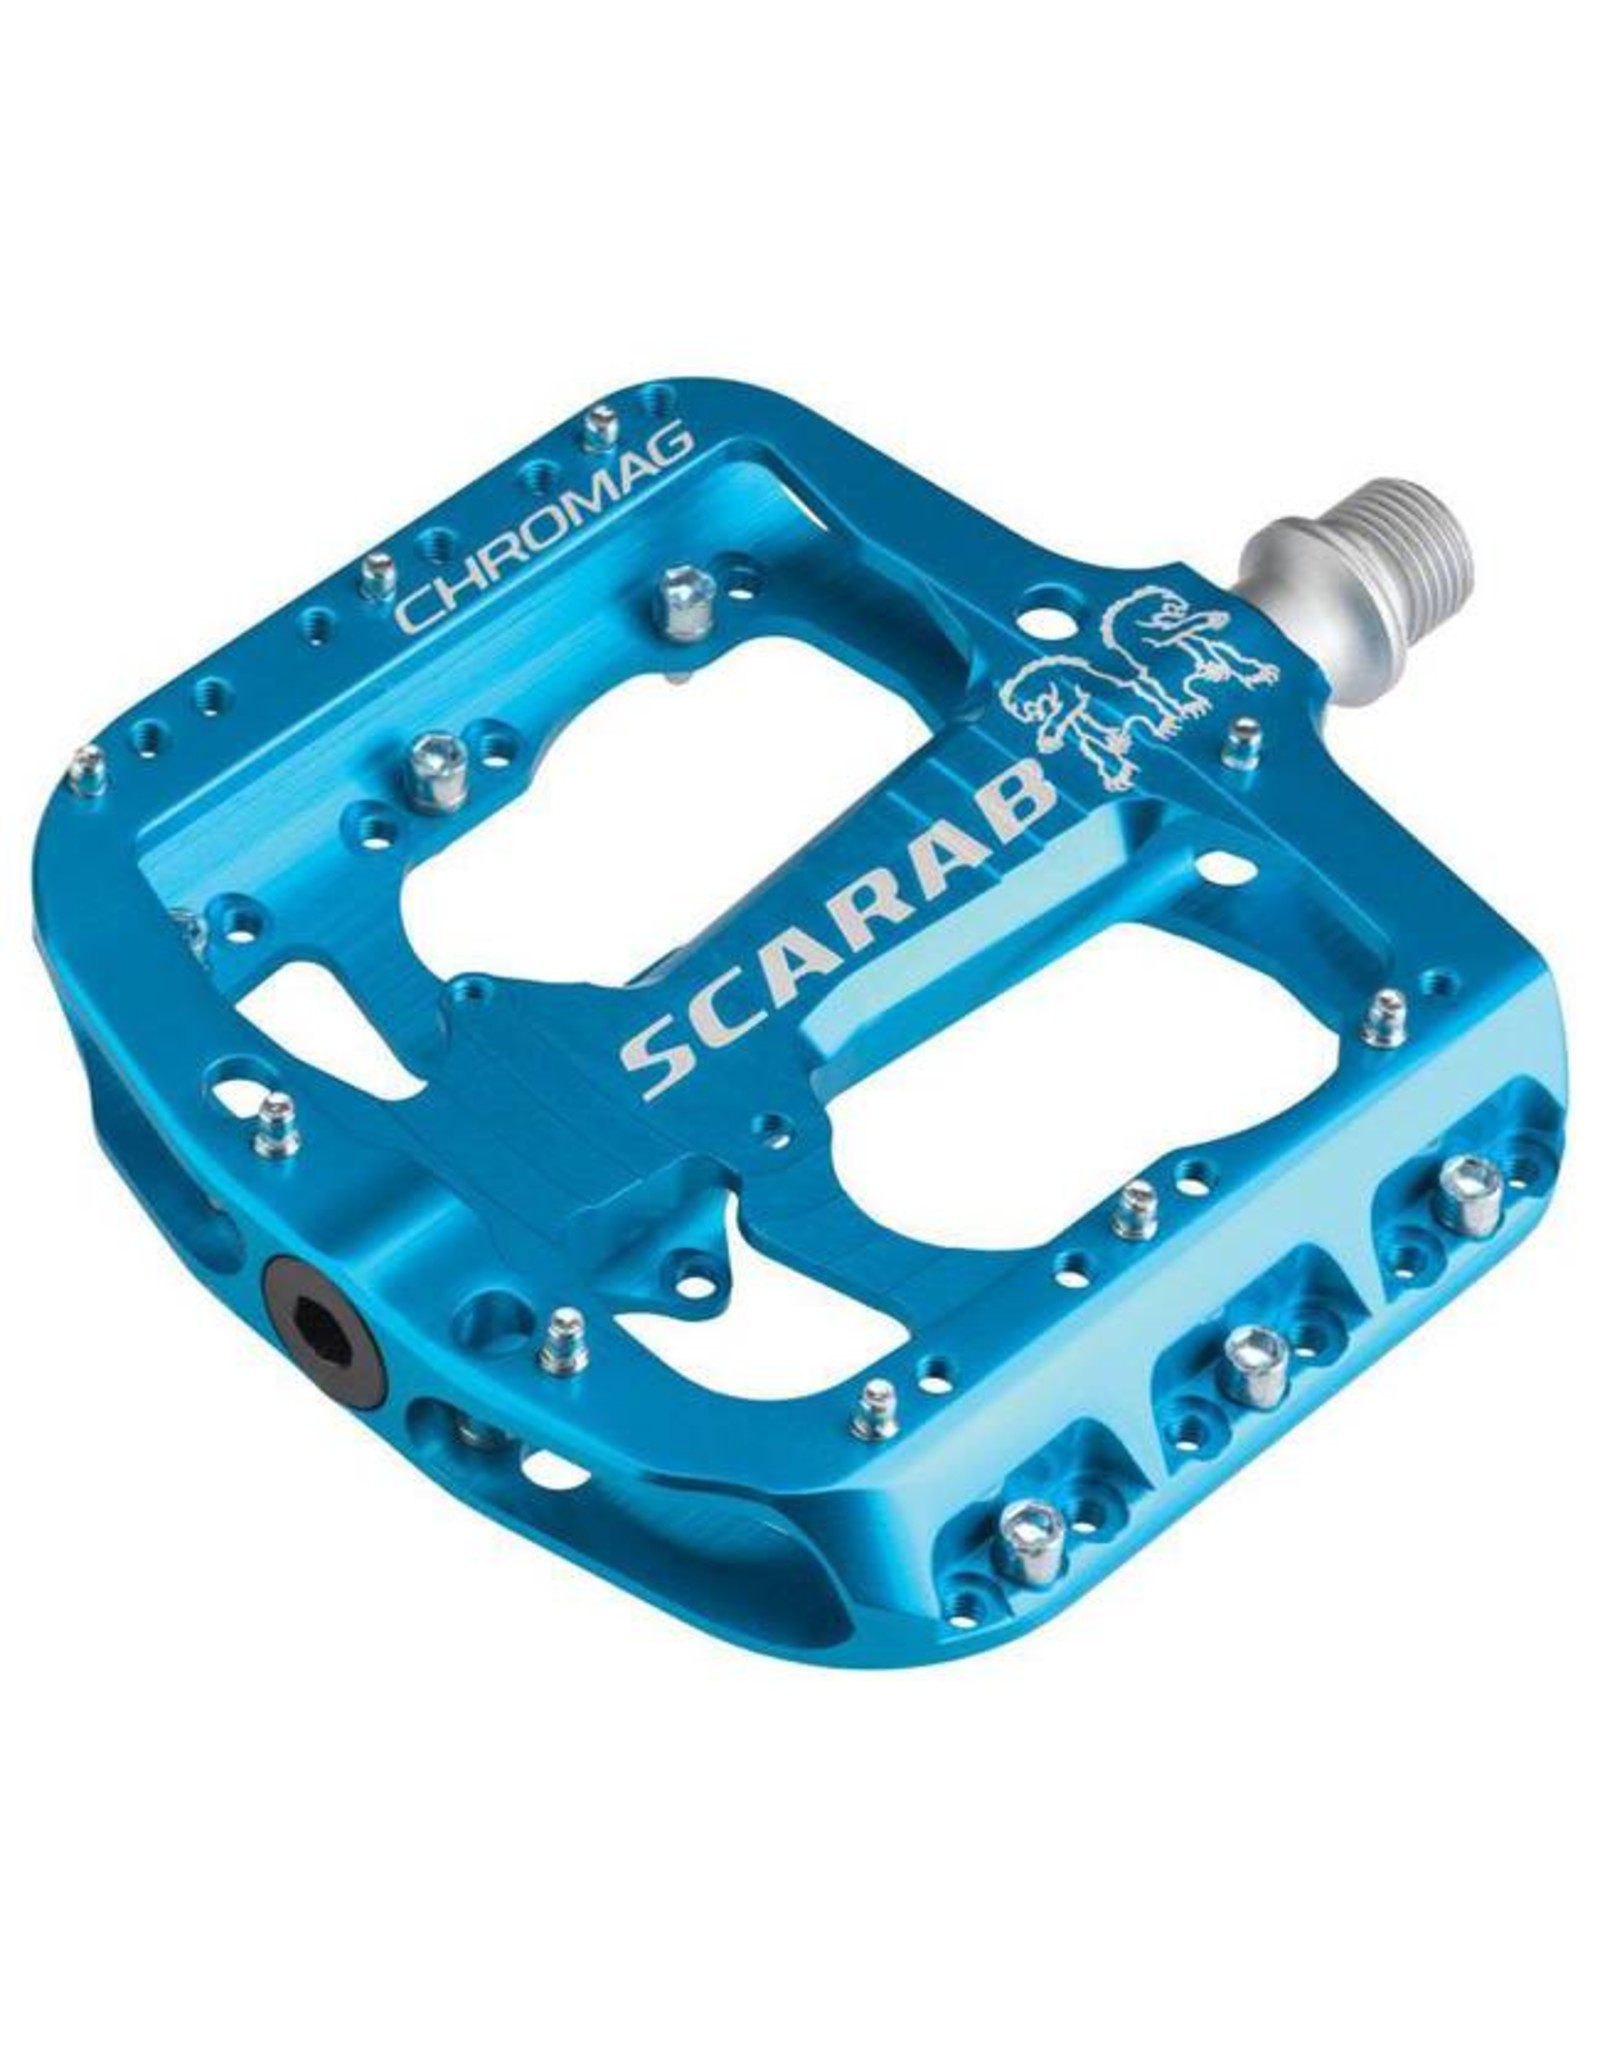 "Chromag Scarab Platform Pedals: 9/16"", Blue"